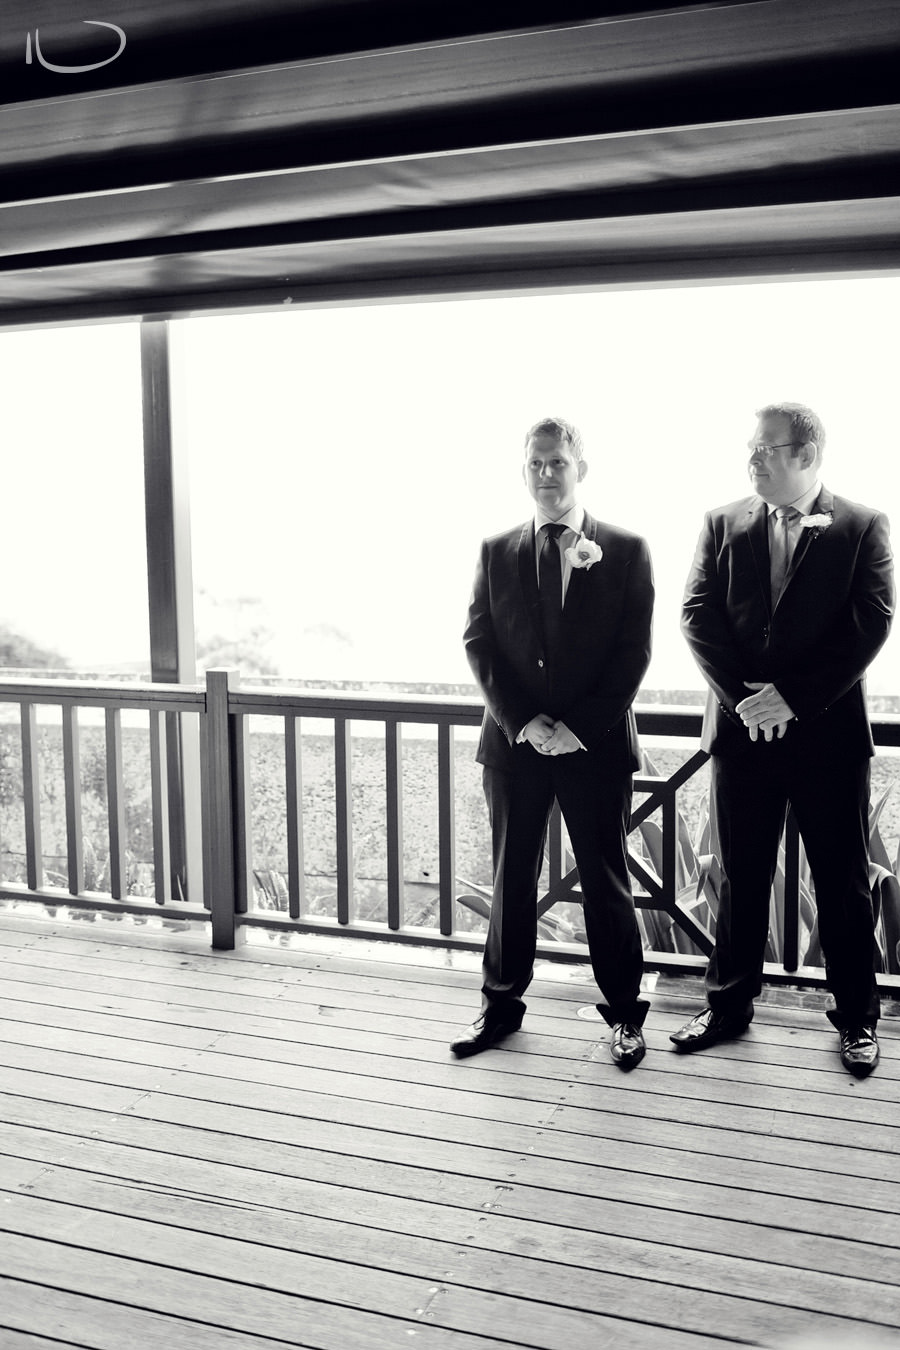 Gunners Barracks Wedding Photographer: Groom waiting for bride